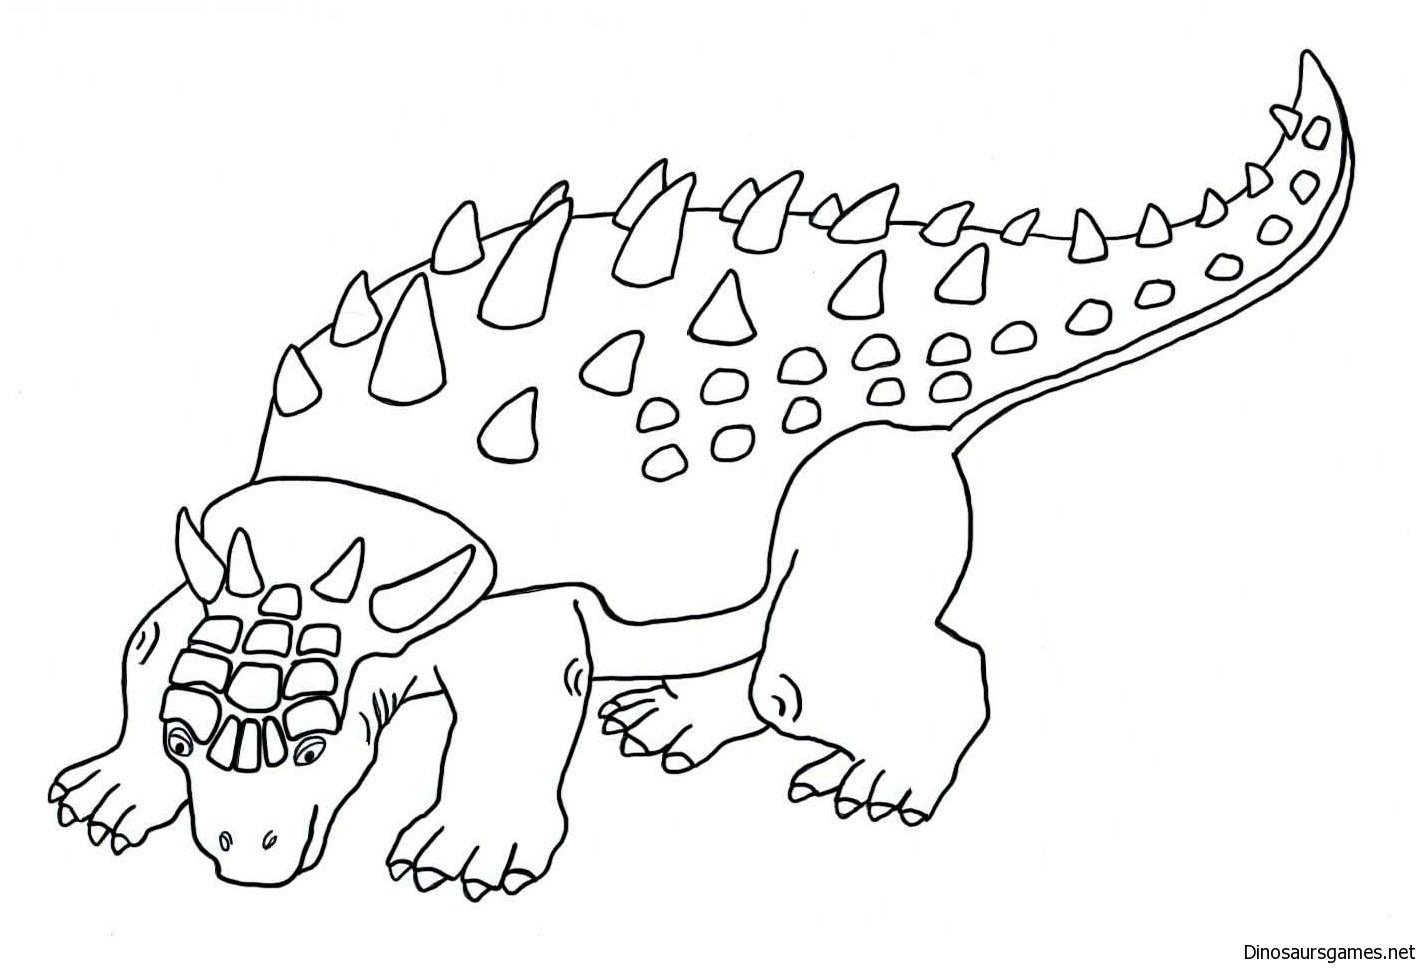 Pin By Dinosaur Games On Ankylosaurus Dinosaur Coloring